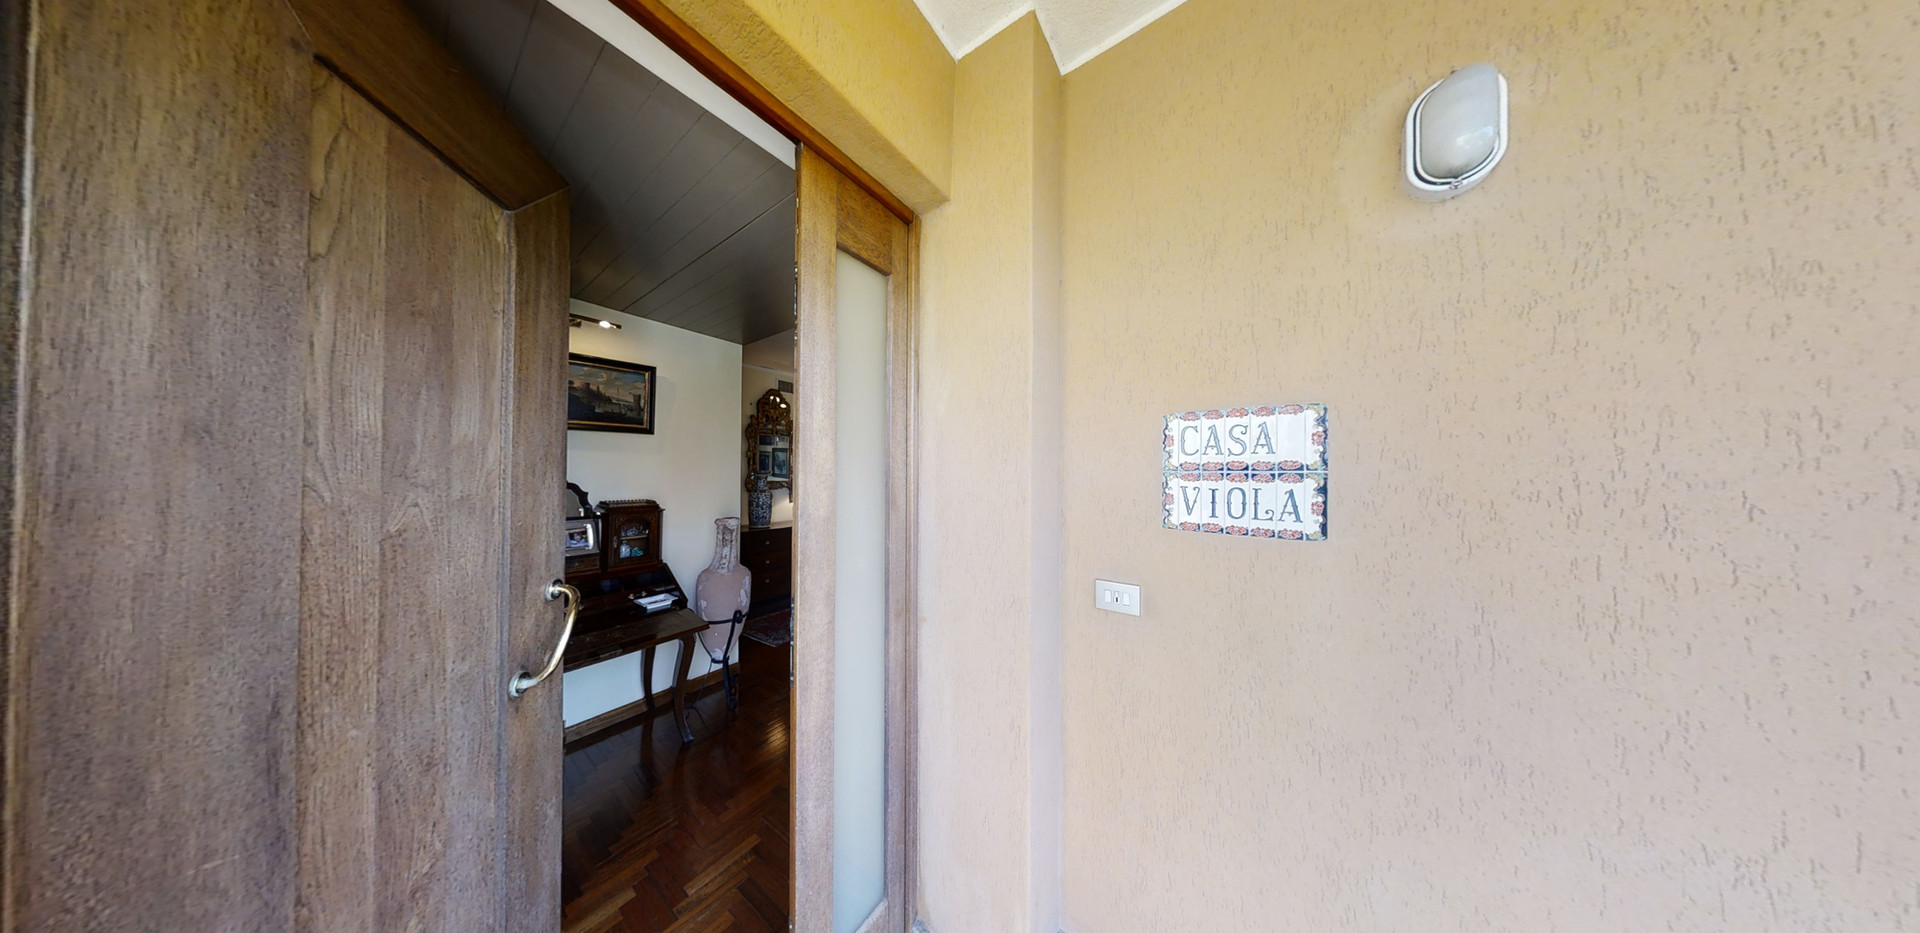 Casa-Viola-05132020_150244.jpg